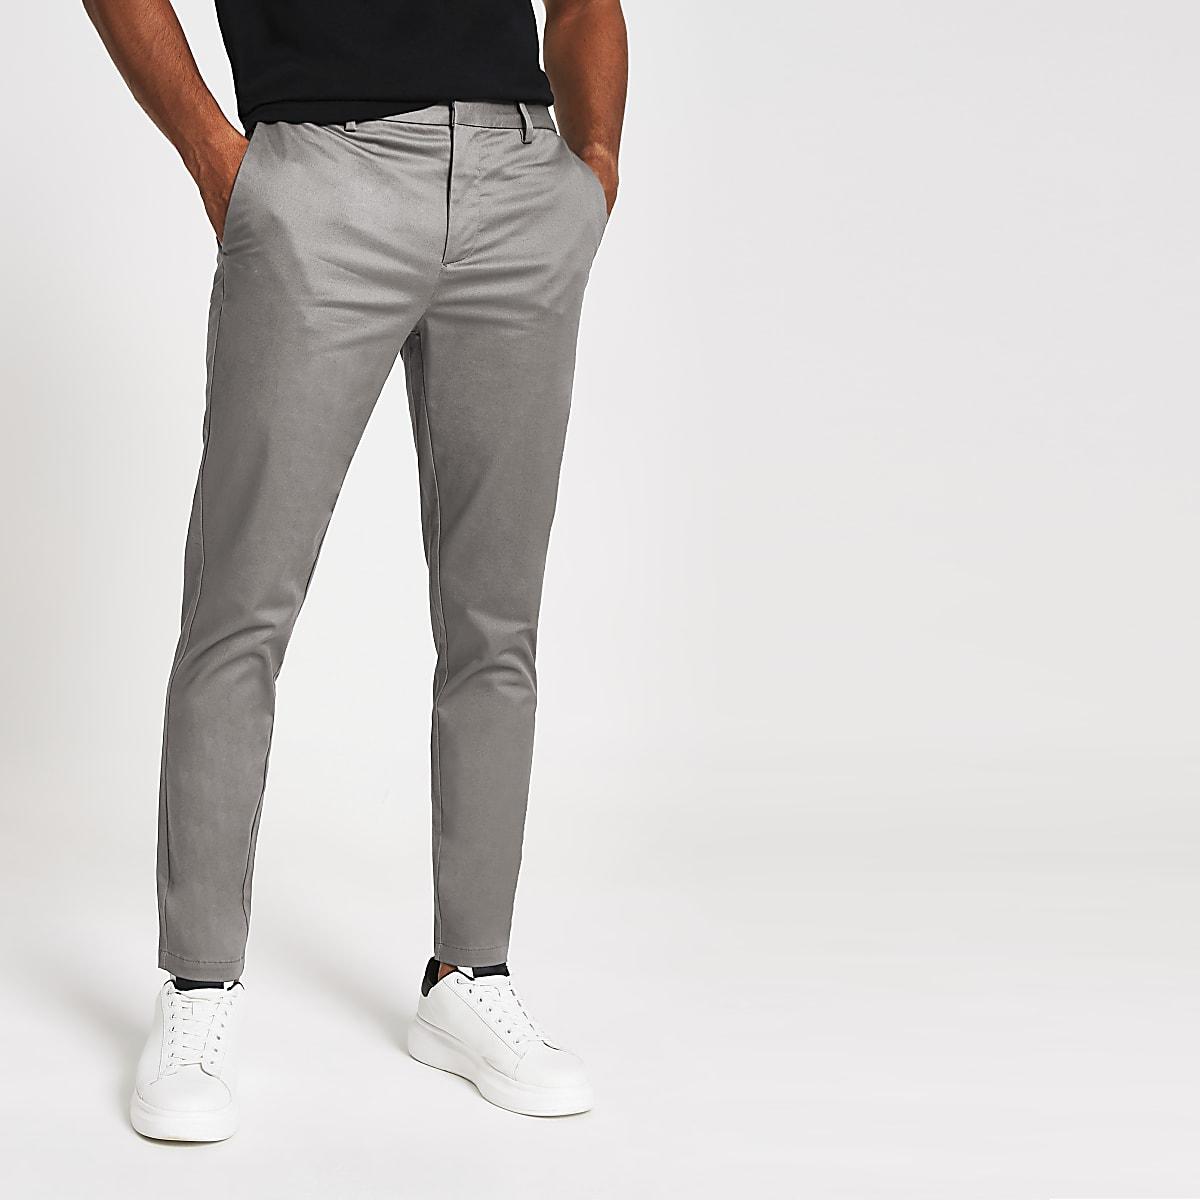 Pantalon chino skinny habillé gris foncé